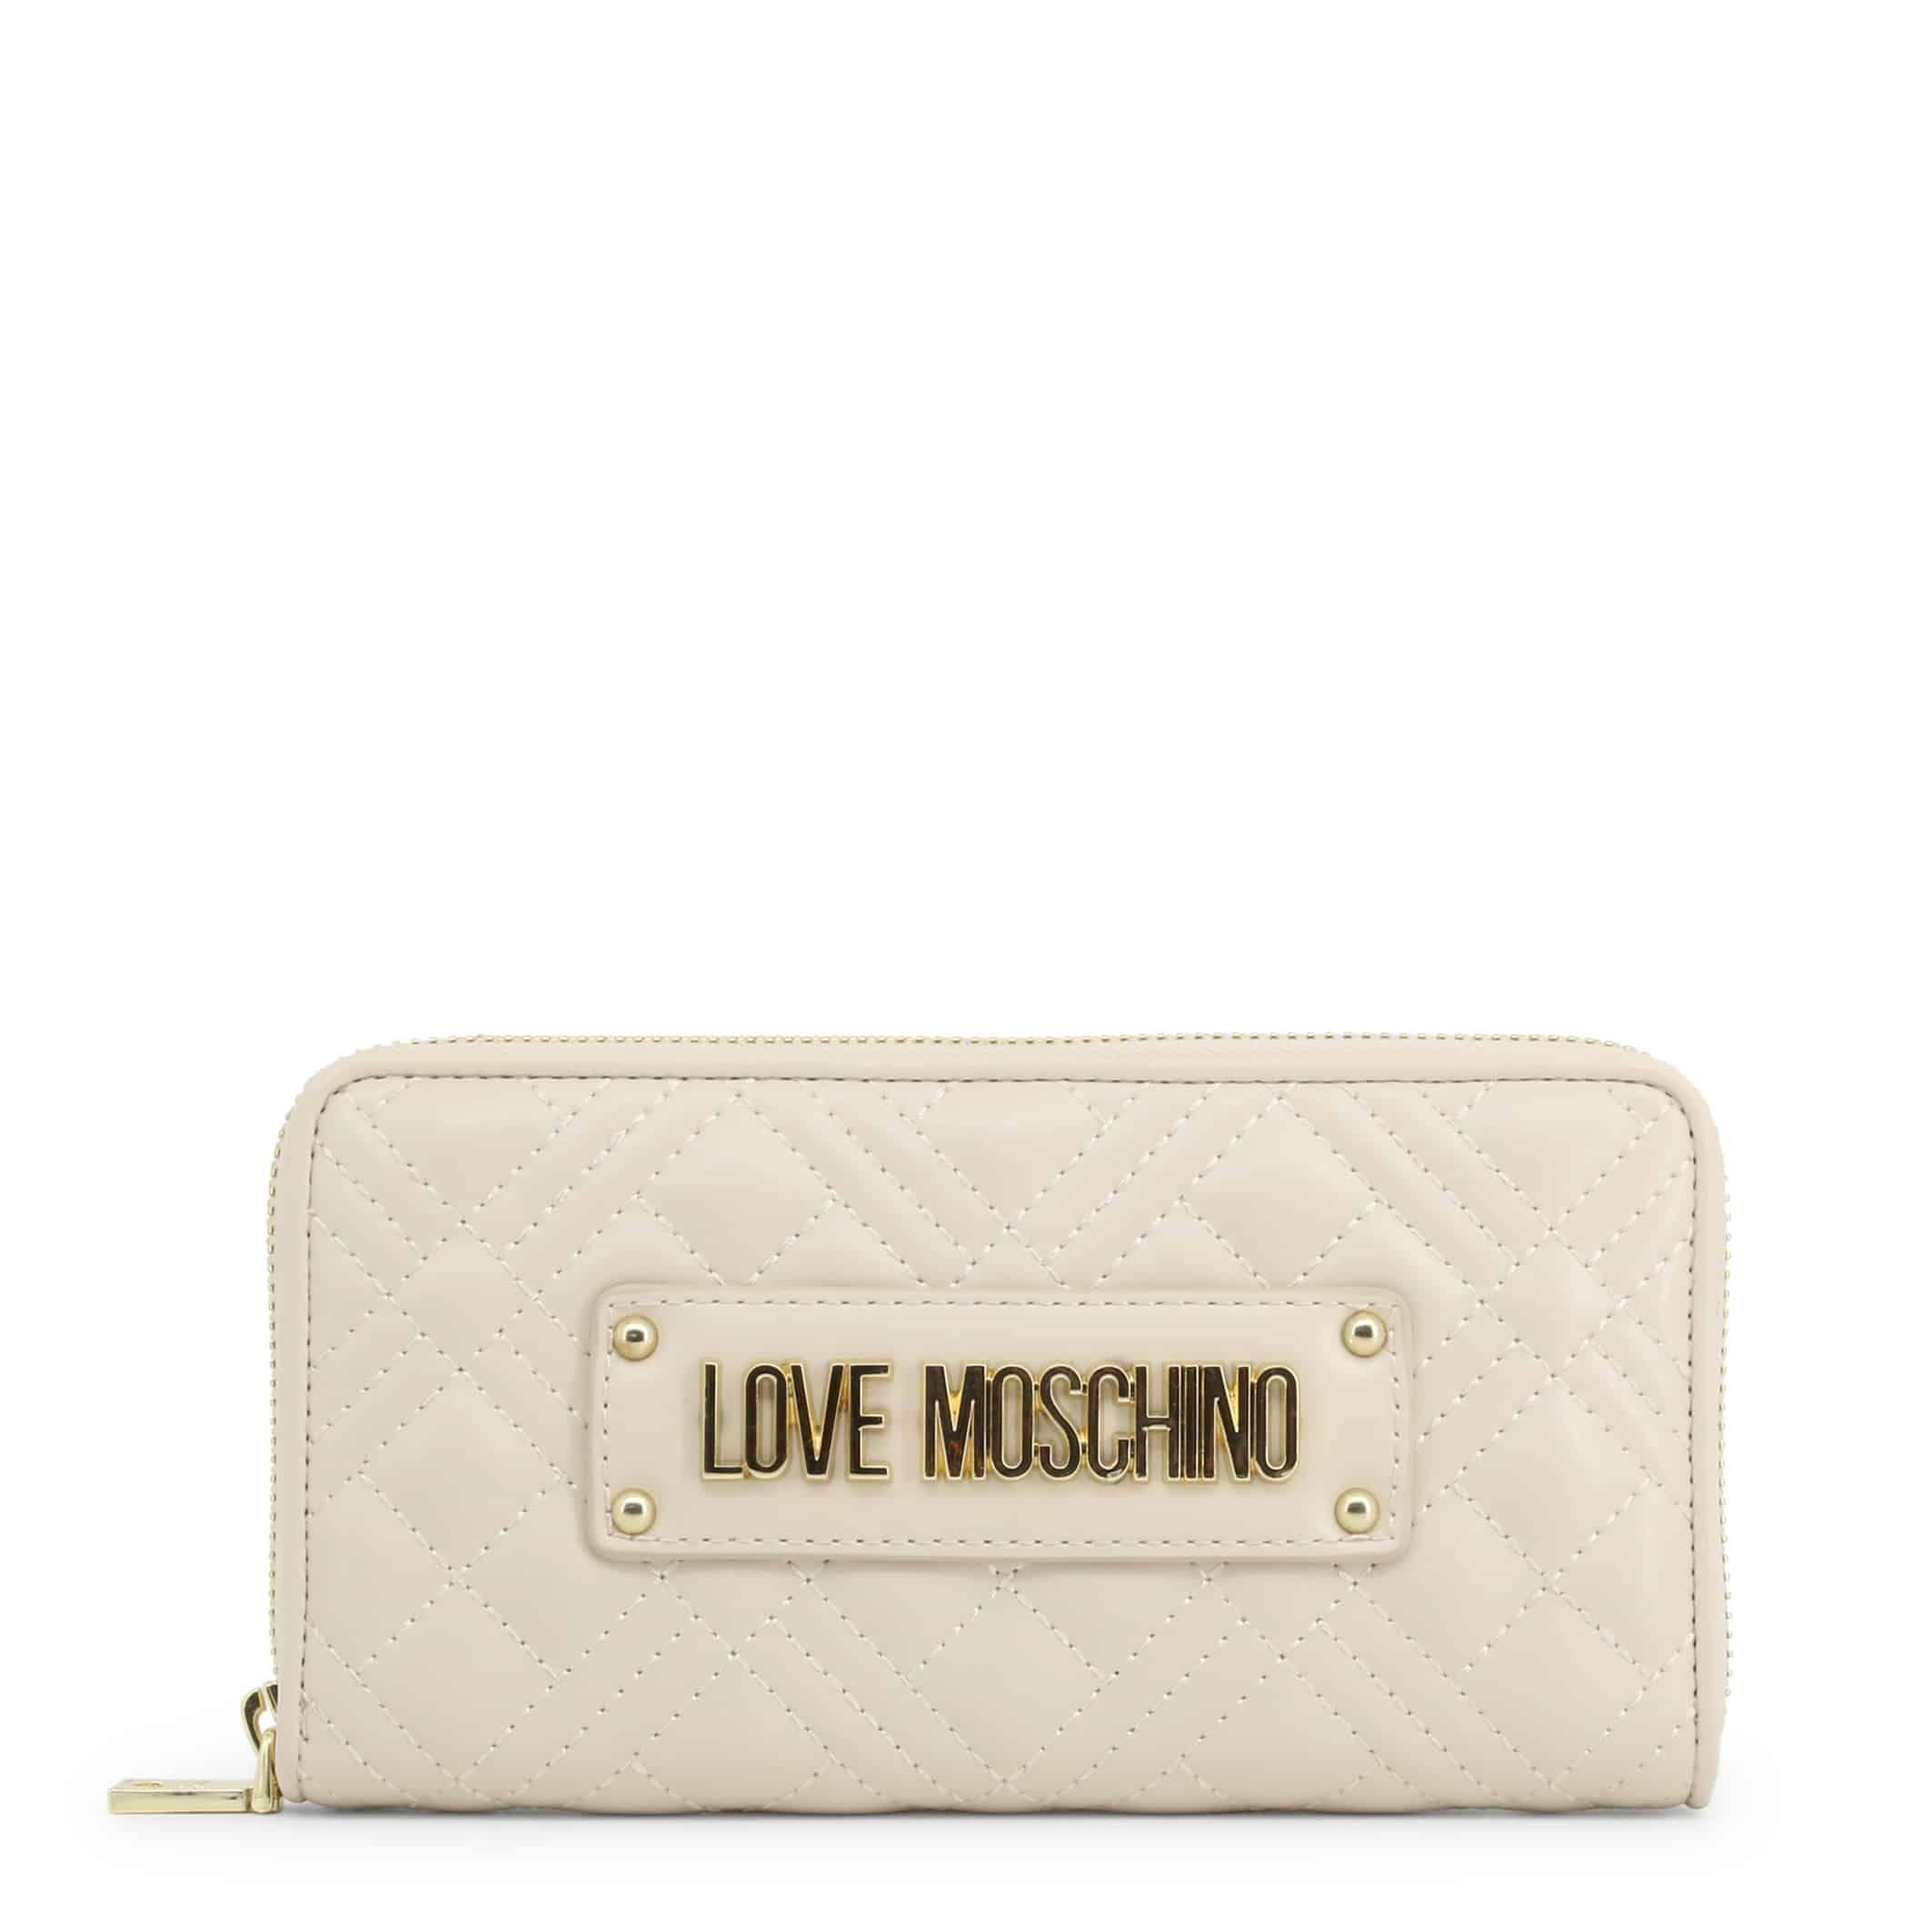 Portefeuilles Love Moschino – JC5553PP16LQ